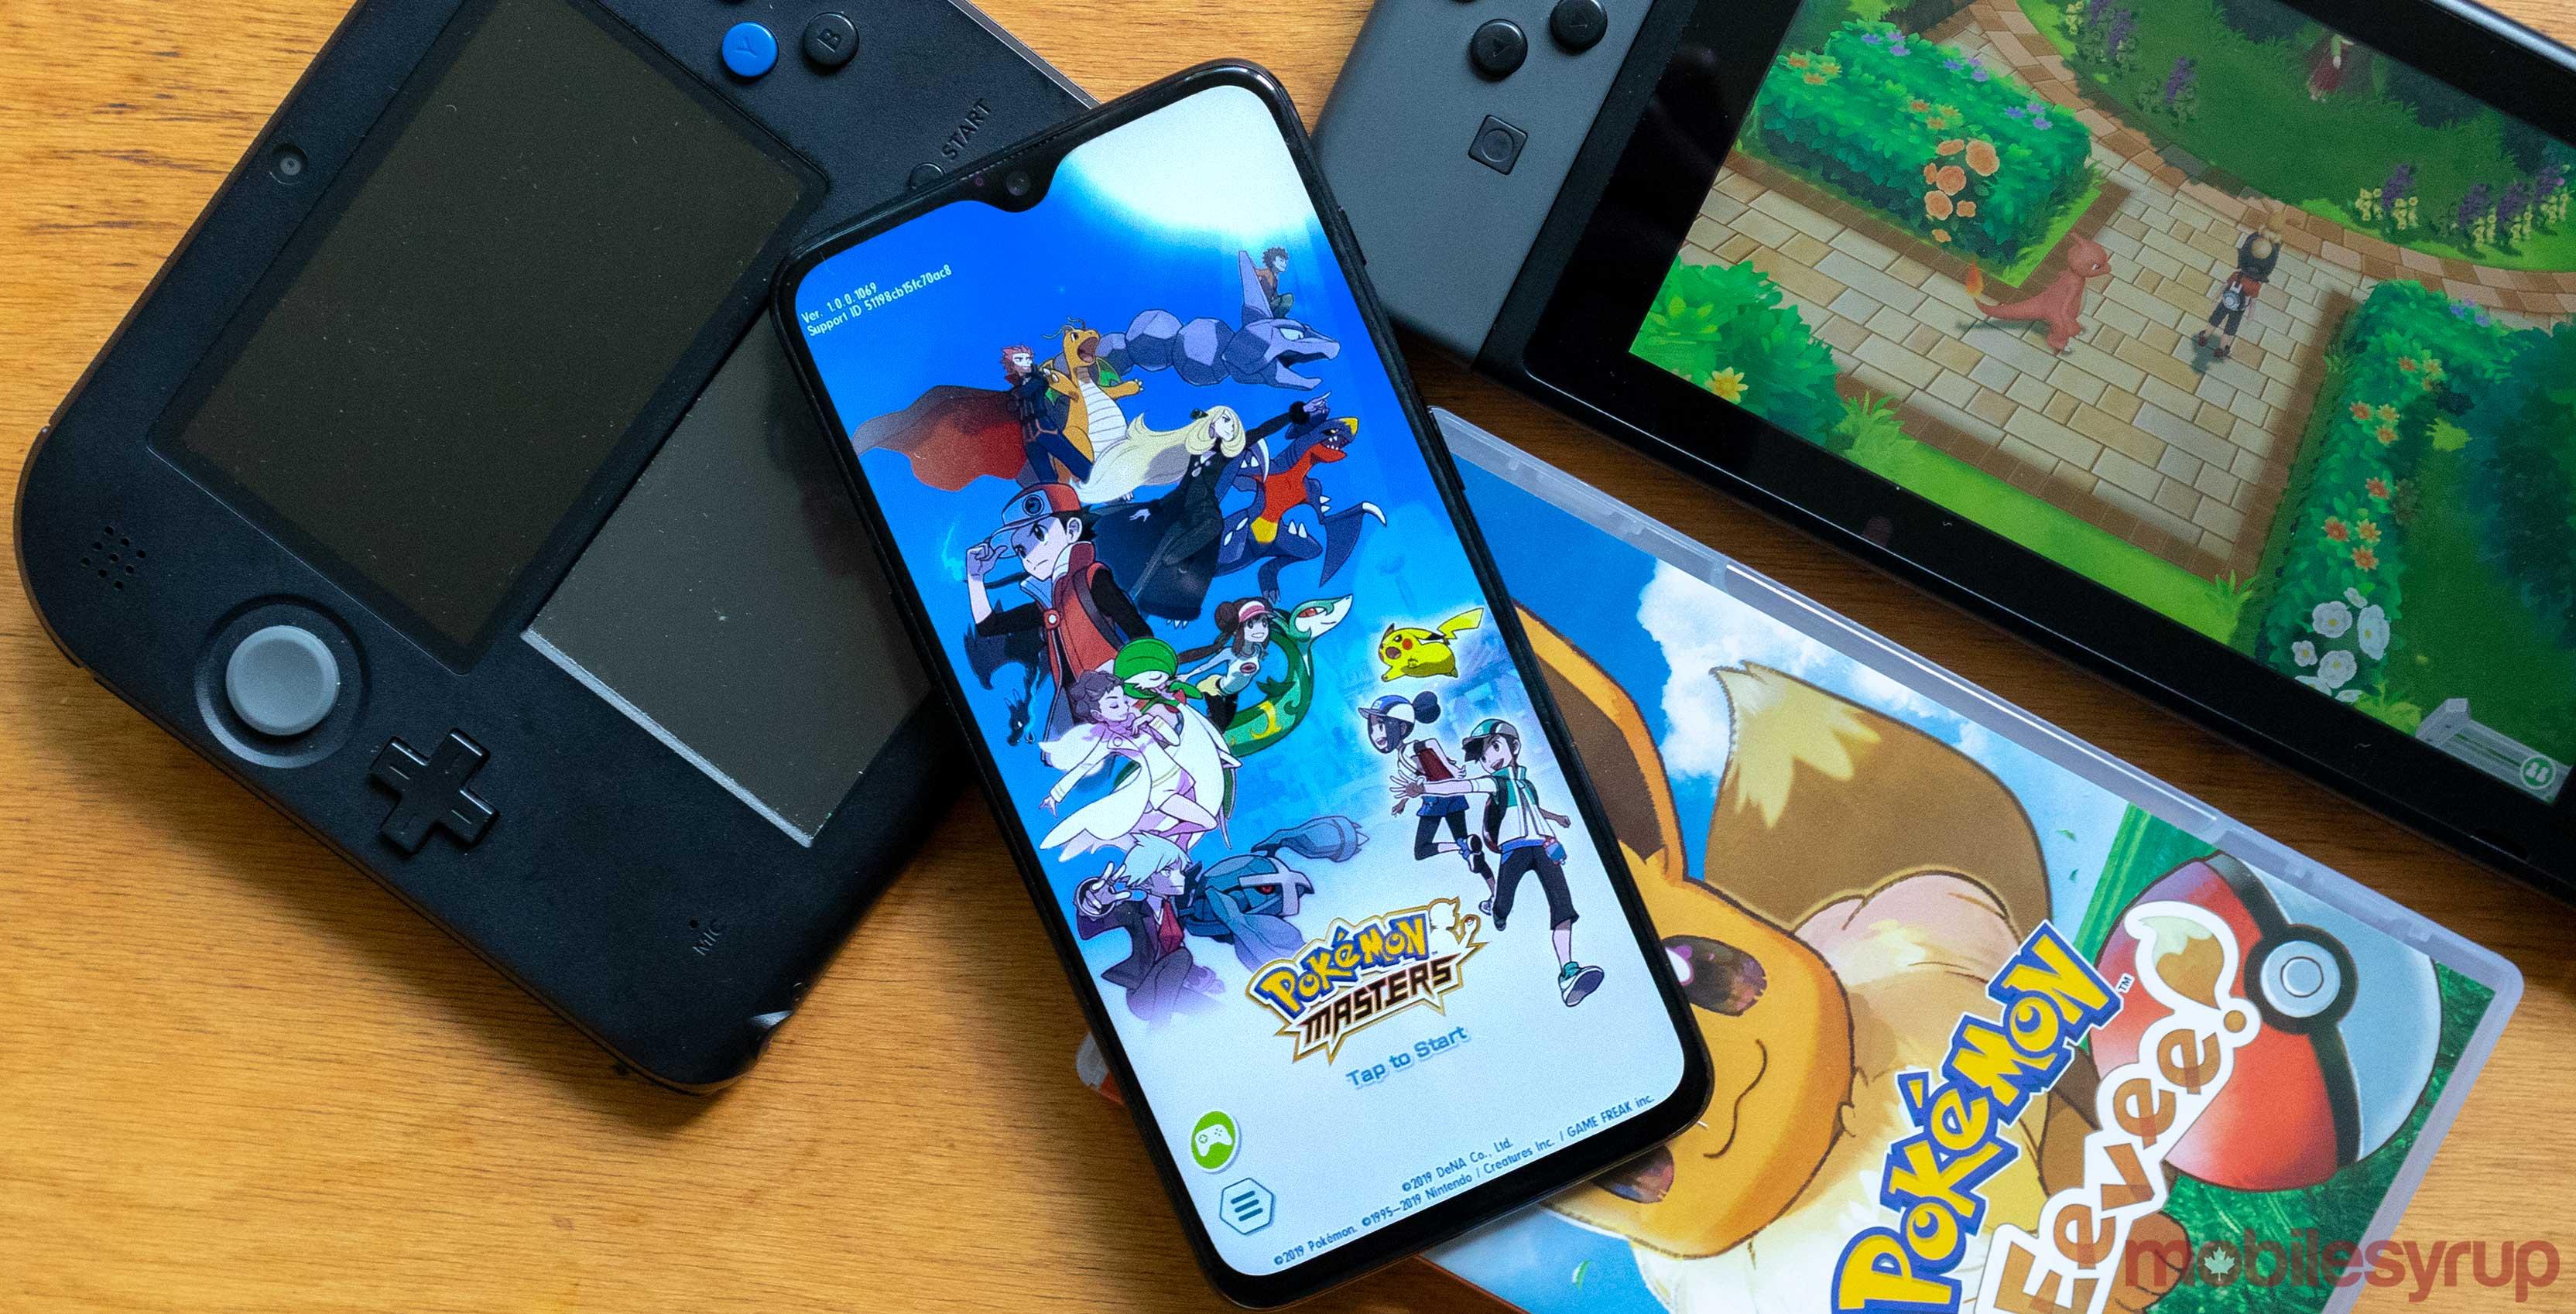 Pokémon Masters helps scratch that Pokémon itch until Sword and